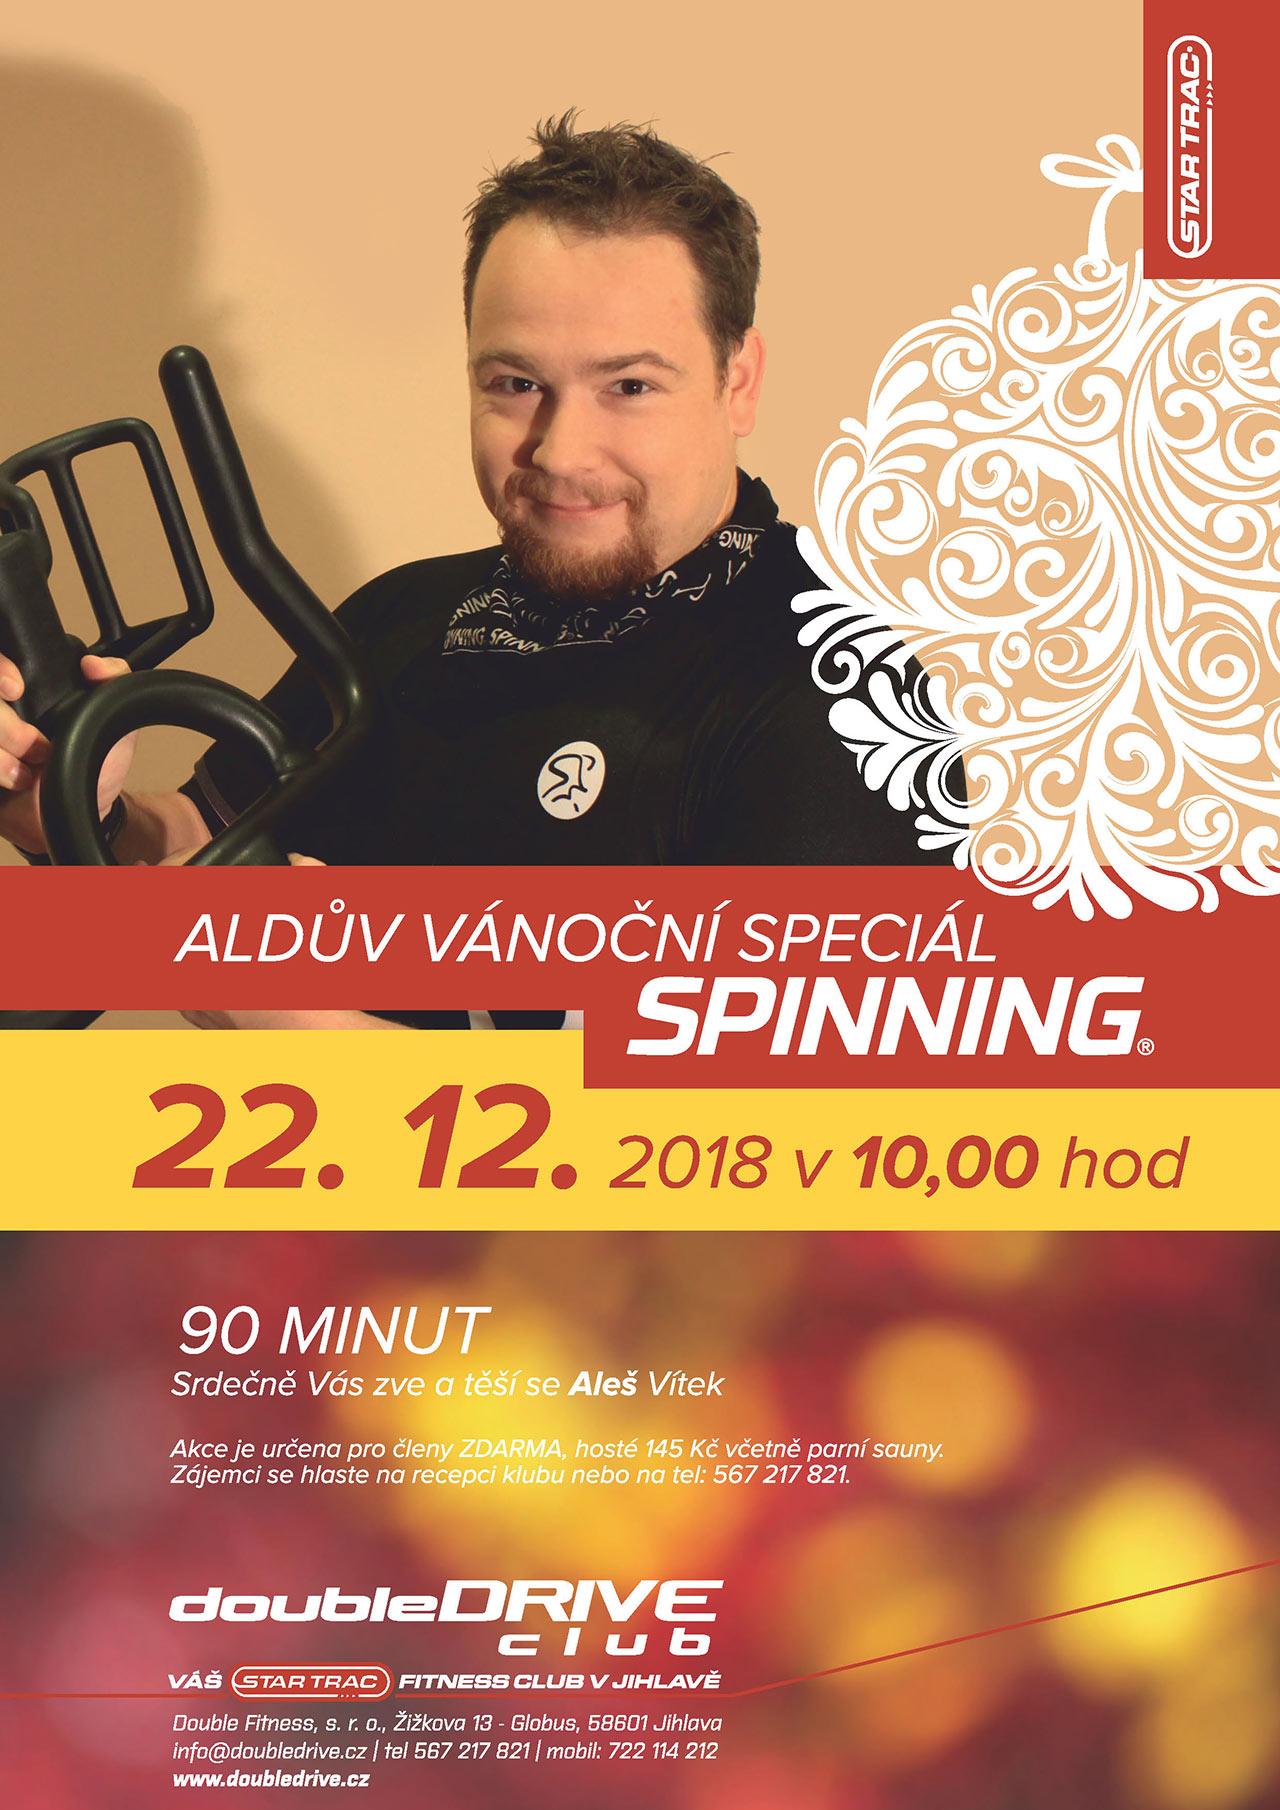 Ddc 20181222 Spin